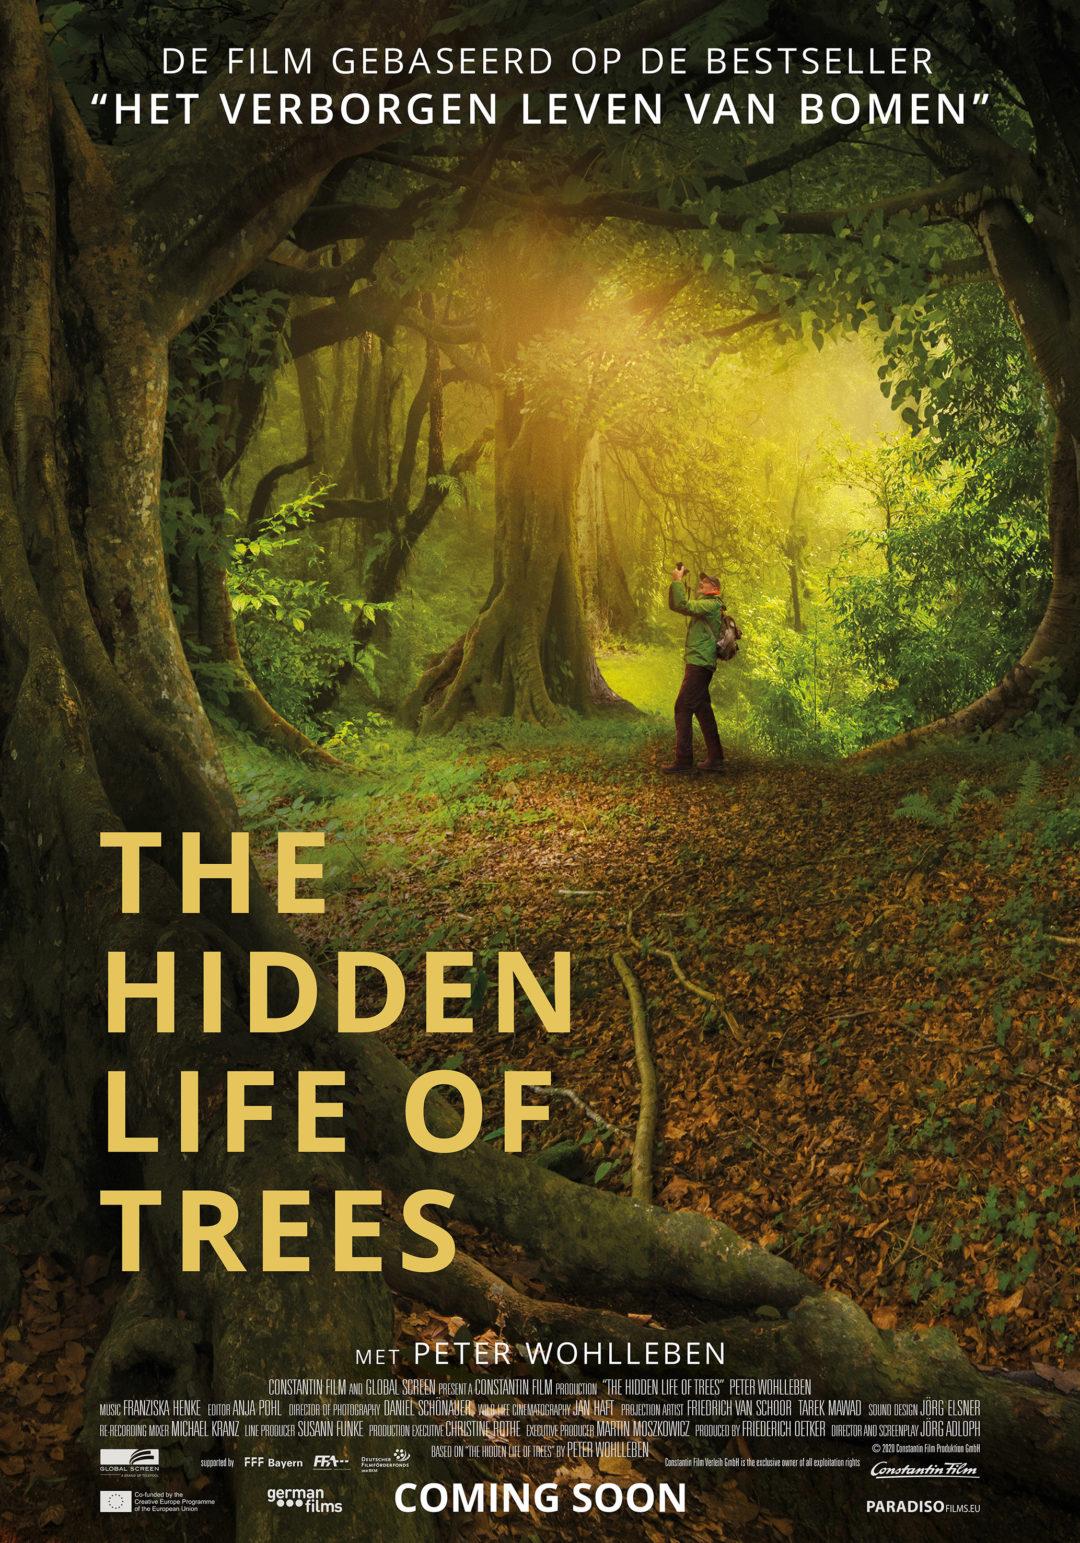 The-Hidden-Life-of-Trees_ps_1_jpg_sd-high_Copyright-Constantin-Film-Verleih-GmbH.jpg